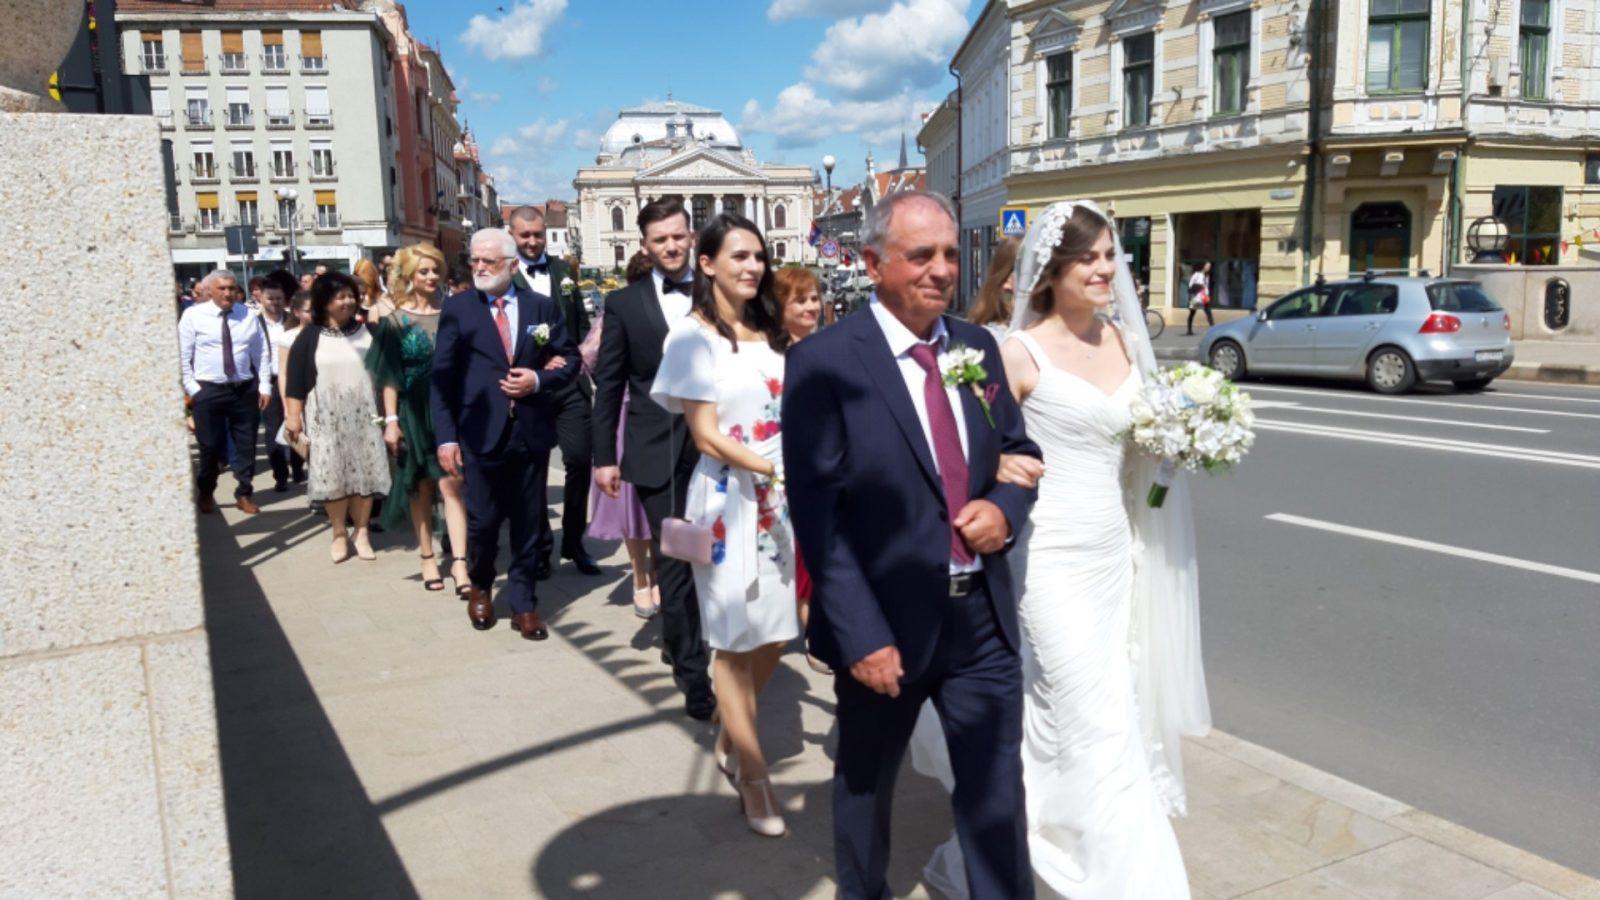 Hochzeitszug in Oradea